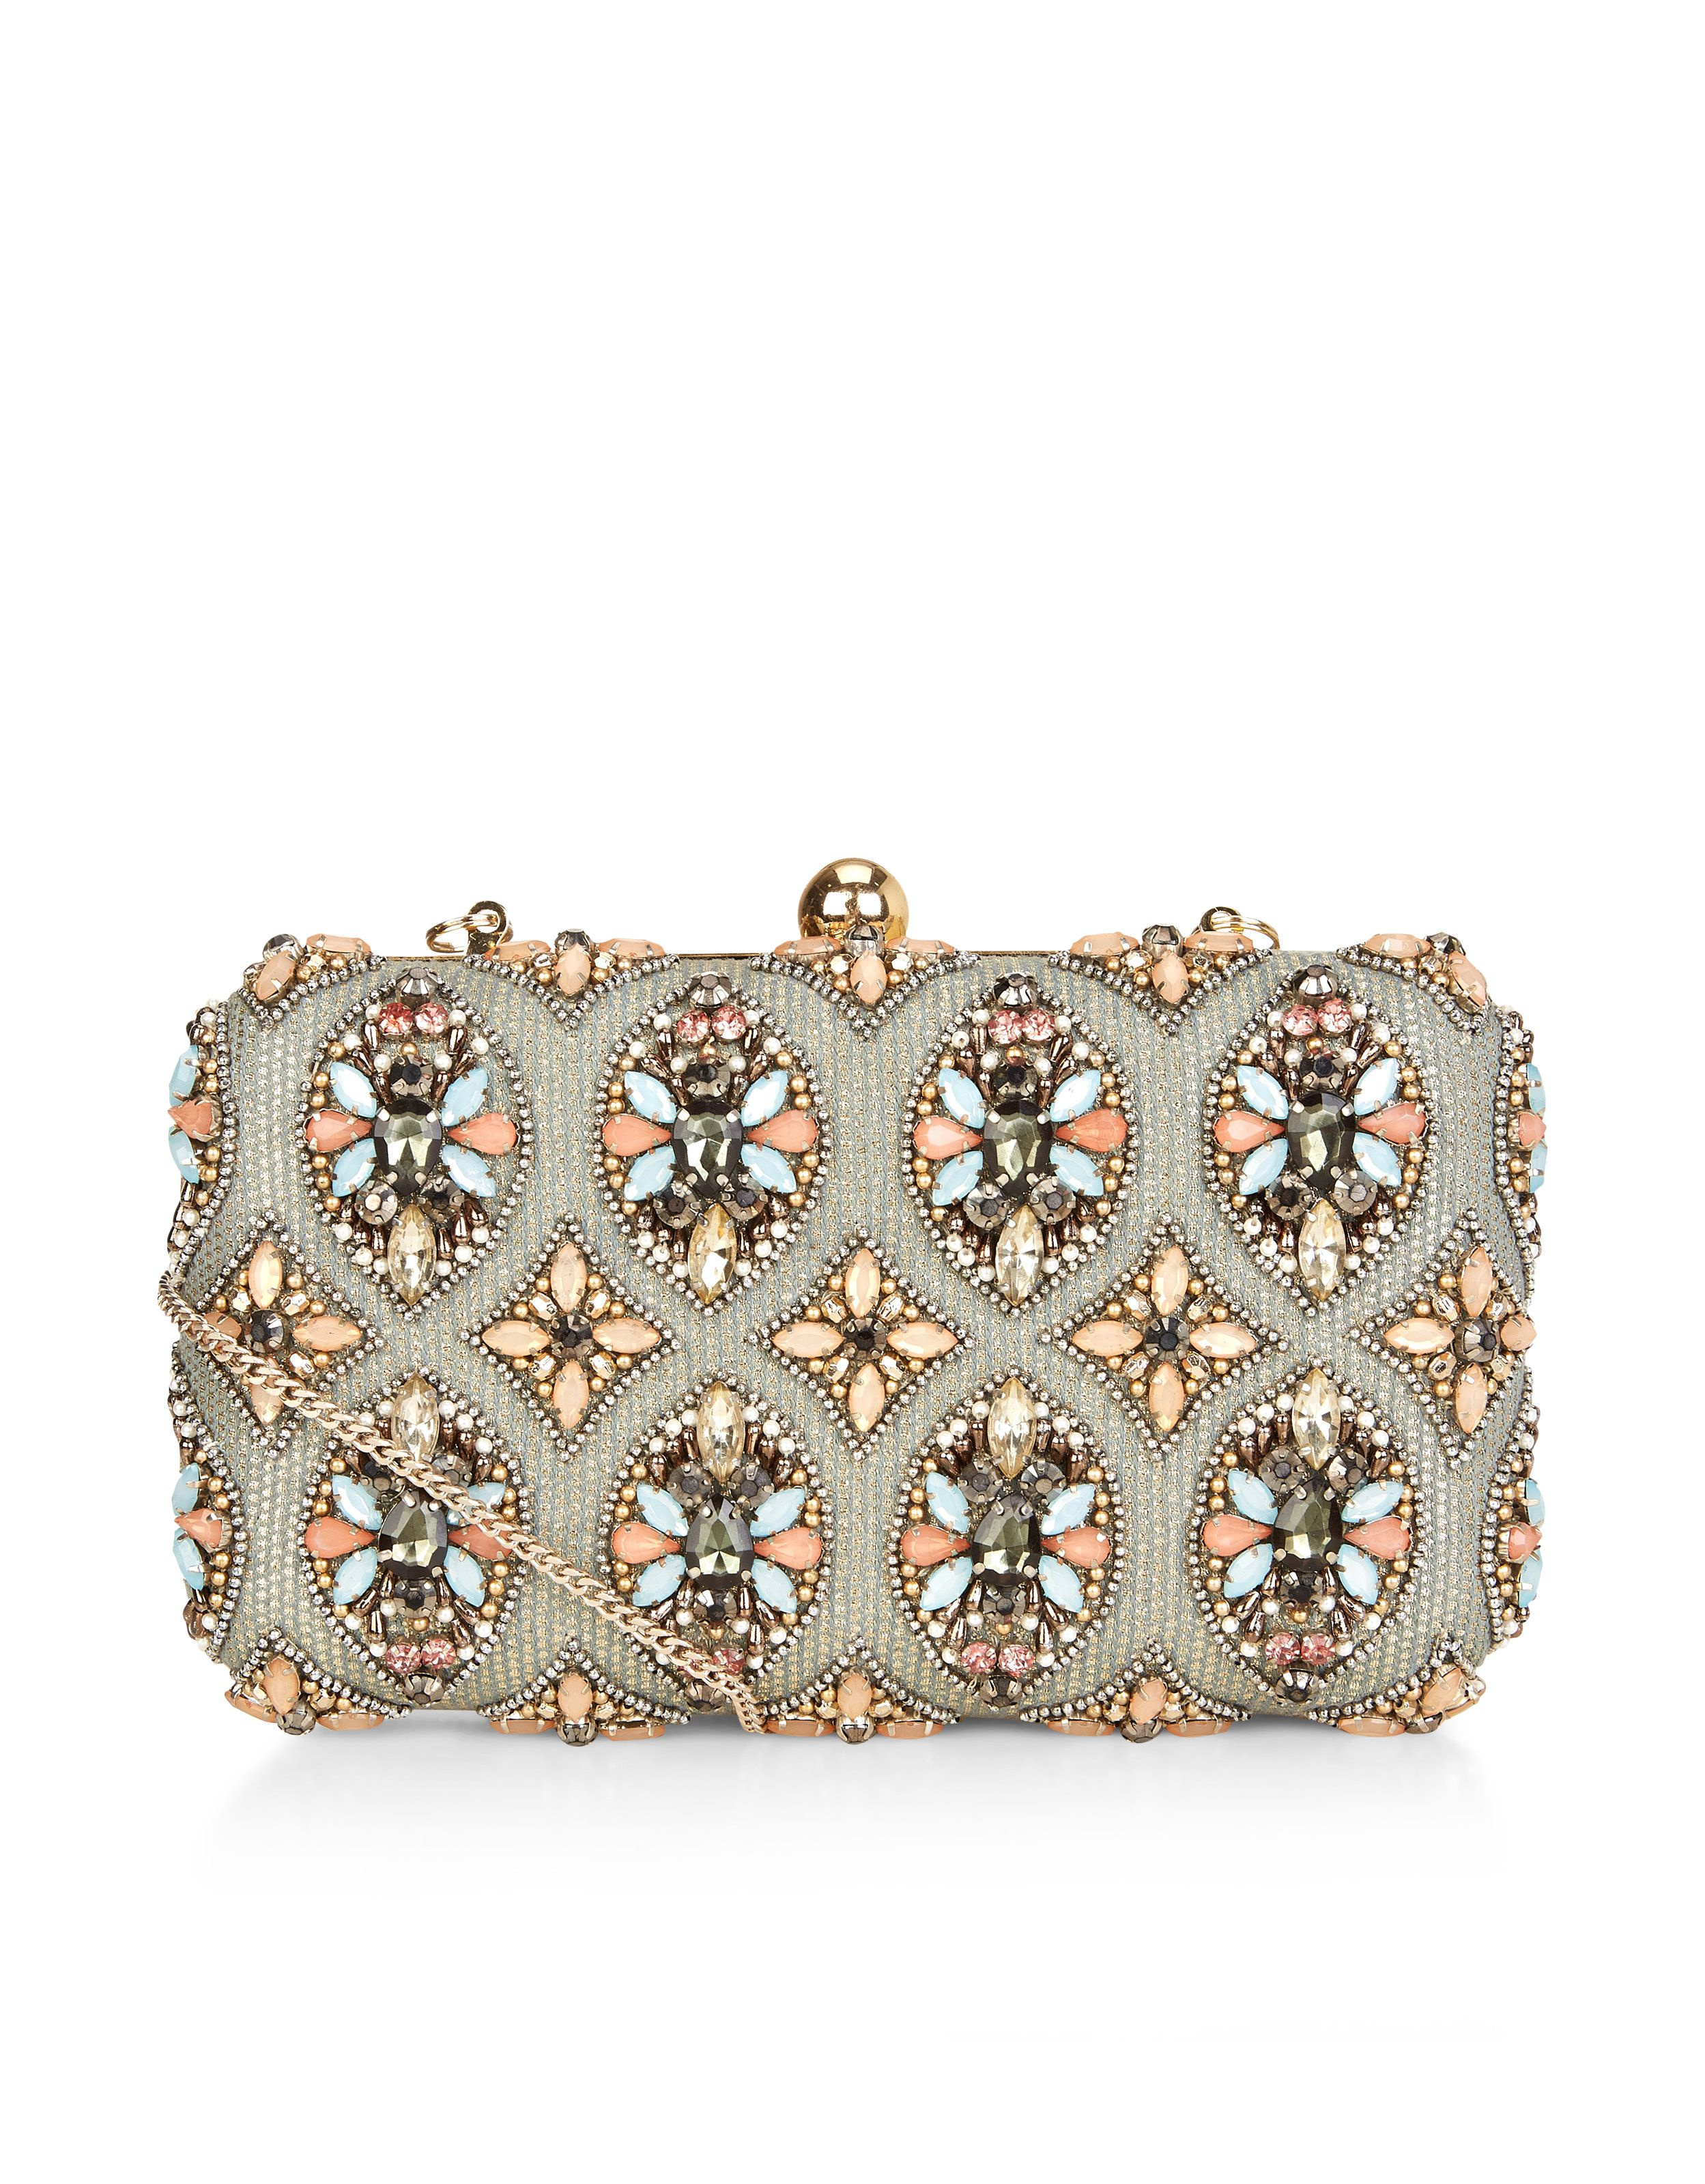 7b4738d288a0 Ava Hardcase Clutch Bag